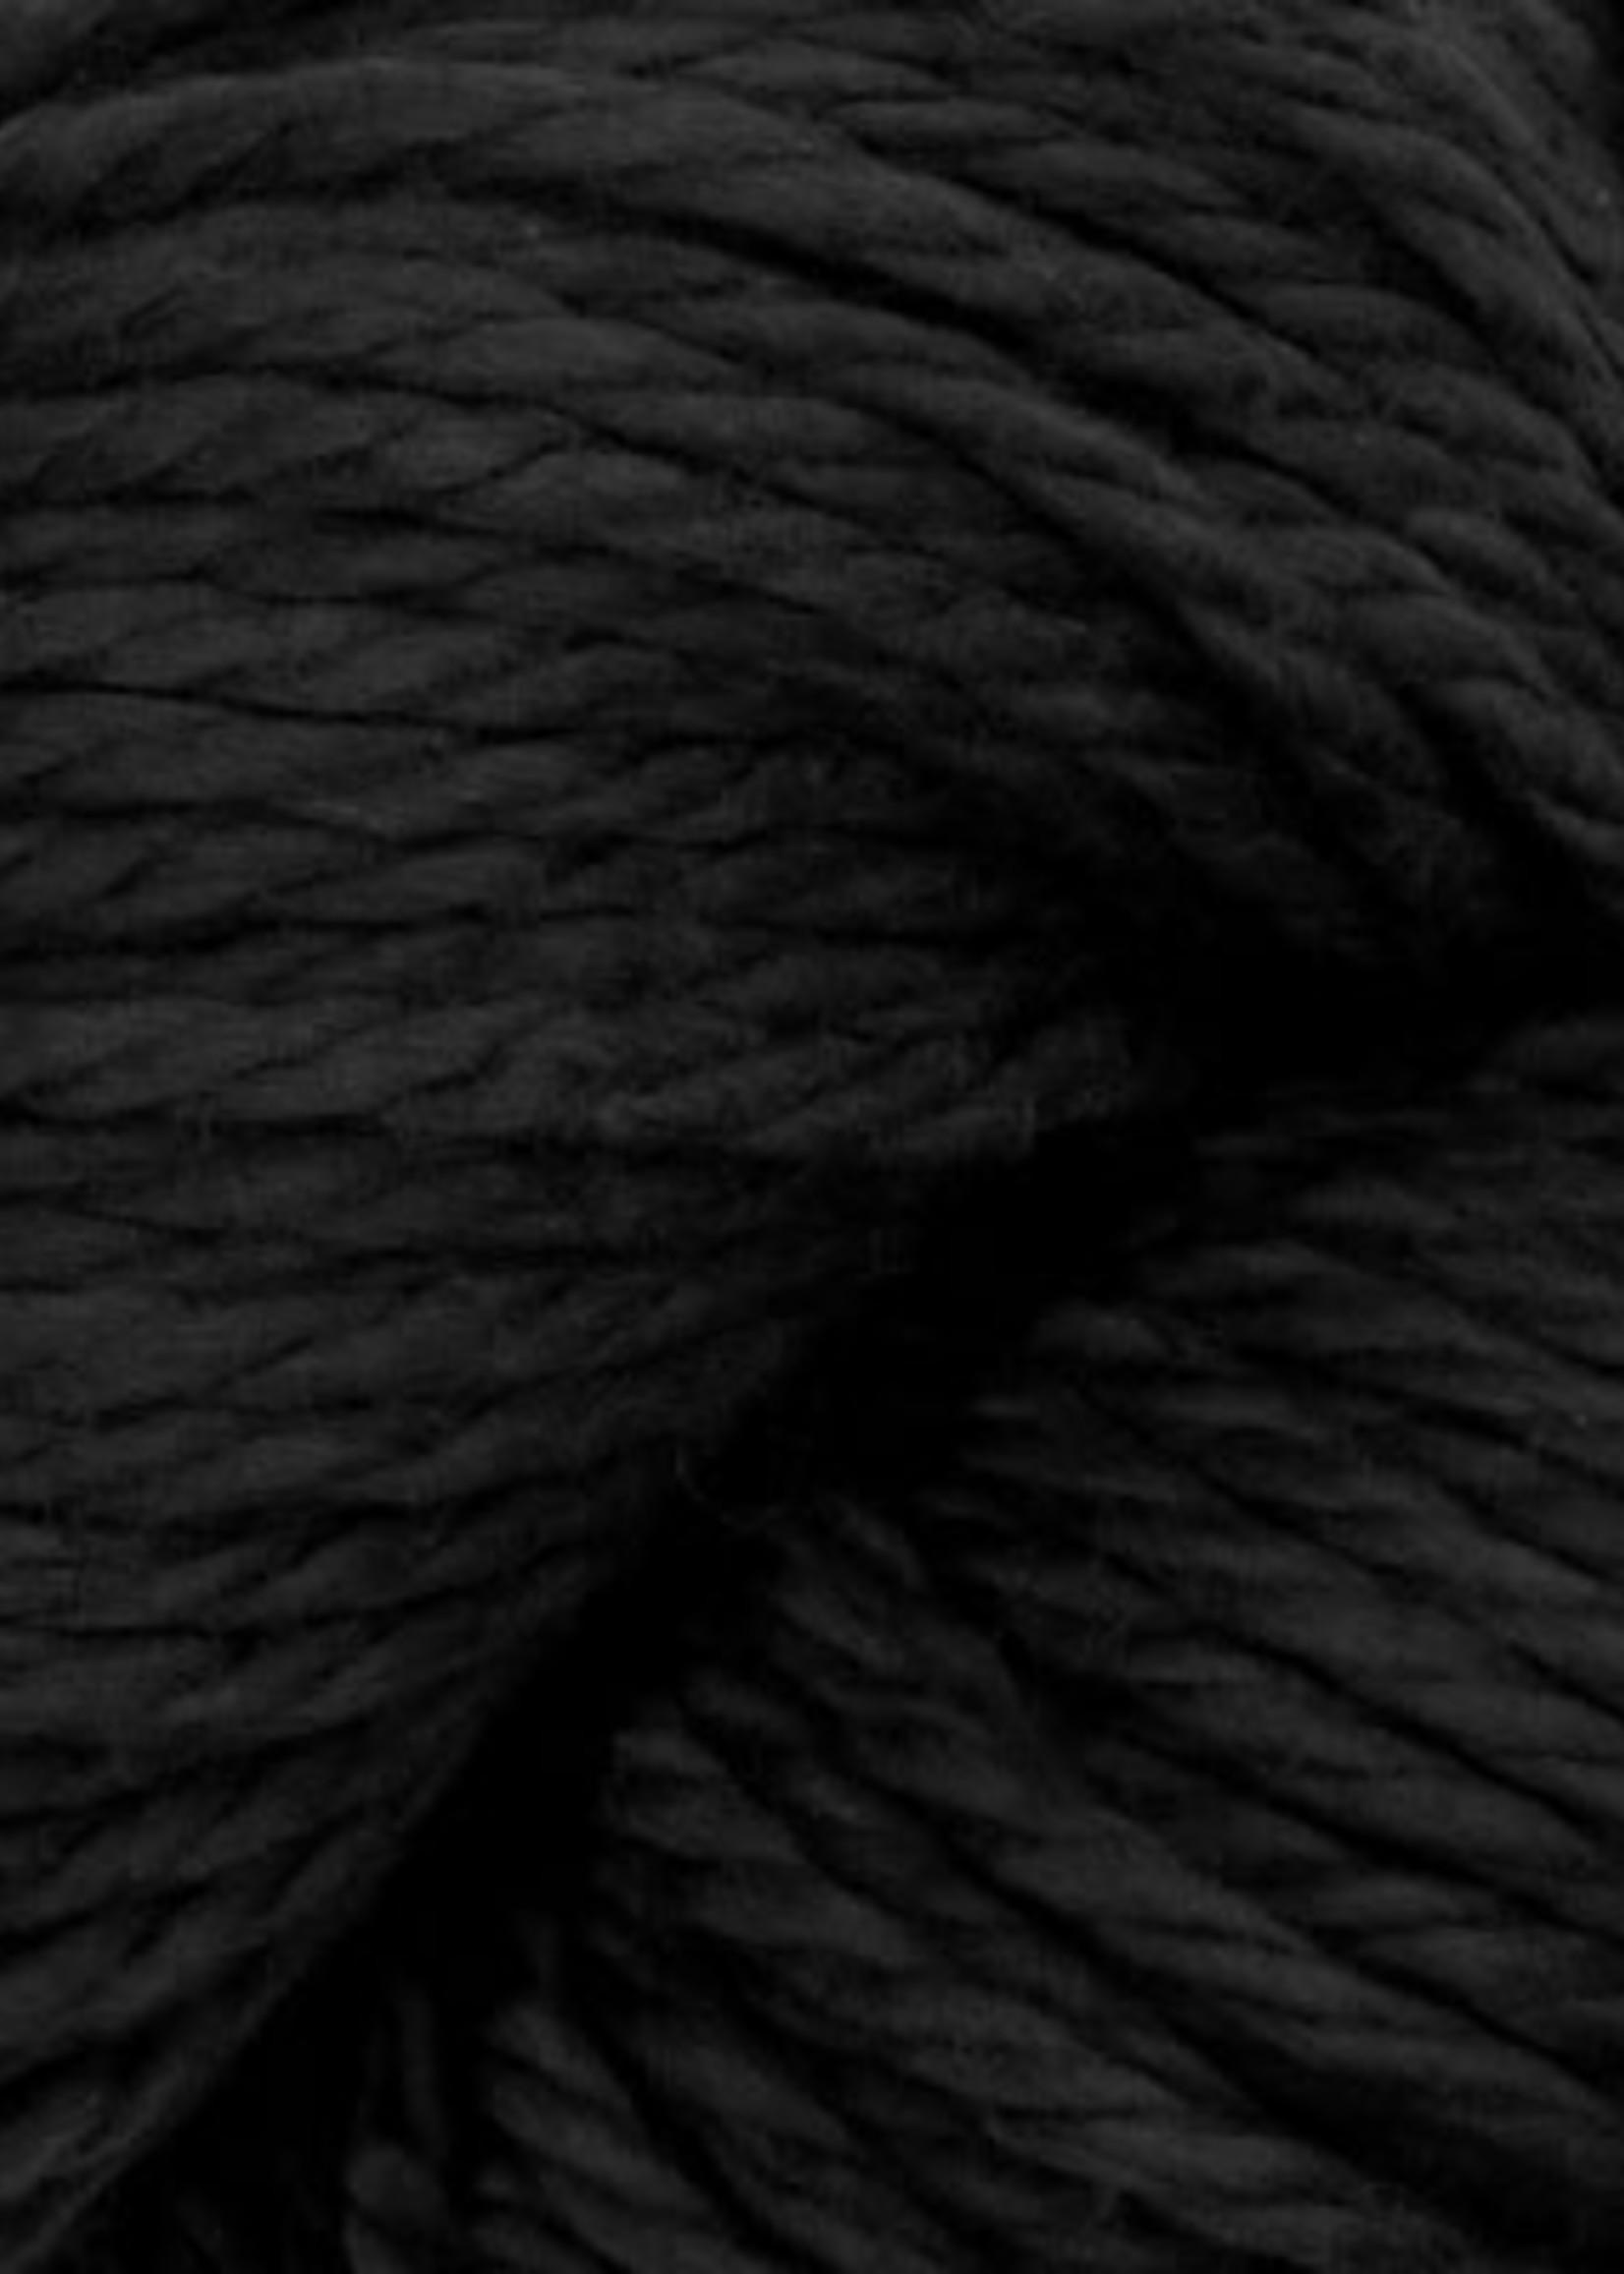 Estelle Estelle Cloud Cotton Yarn #101 Black